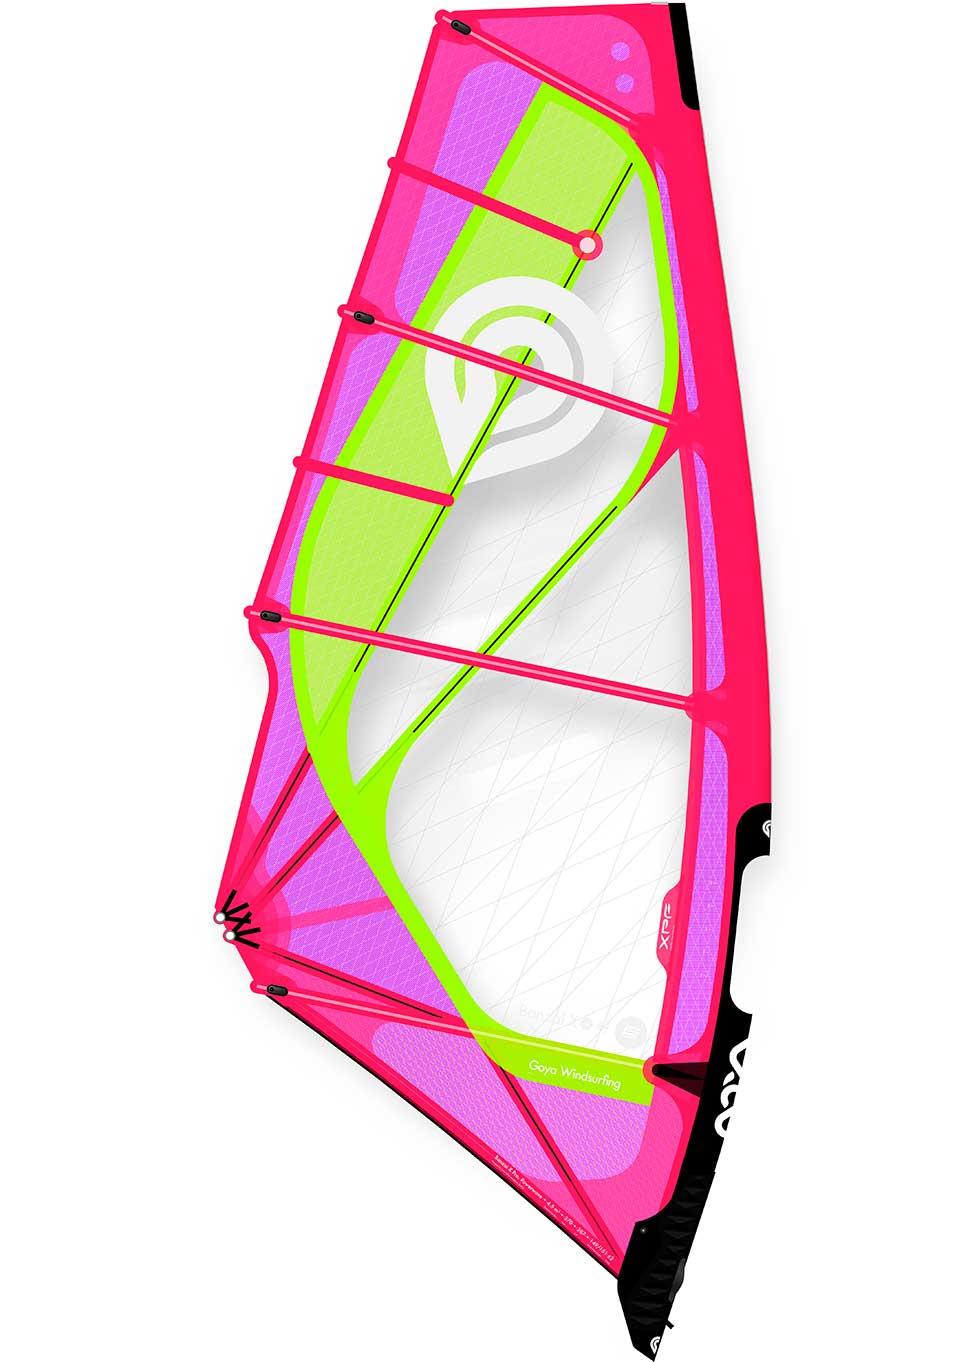 Vela de windsurf Banzai Pro X 20/21